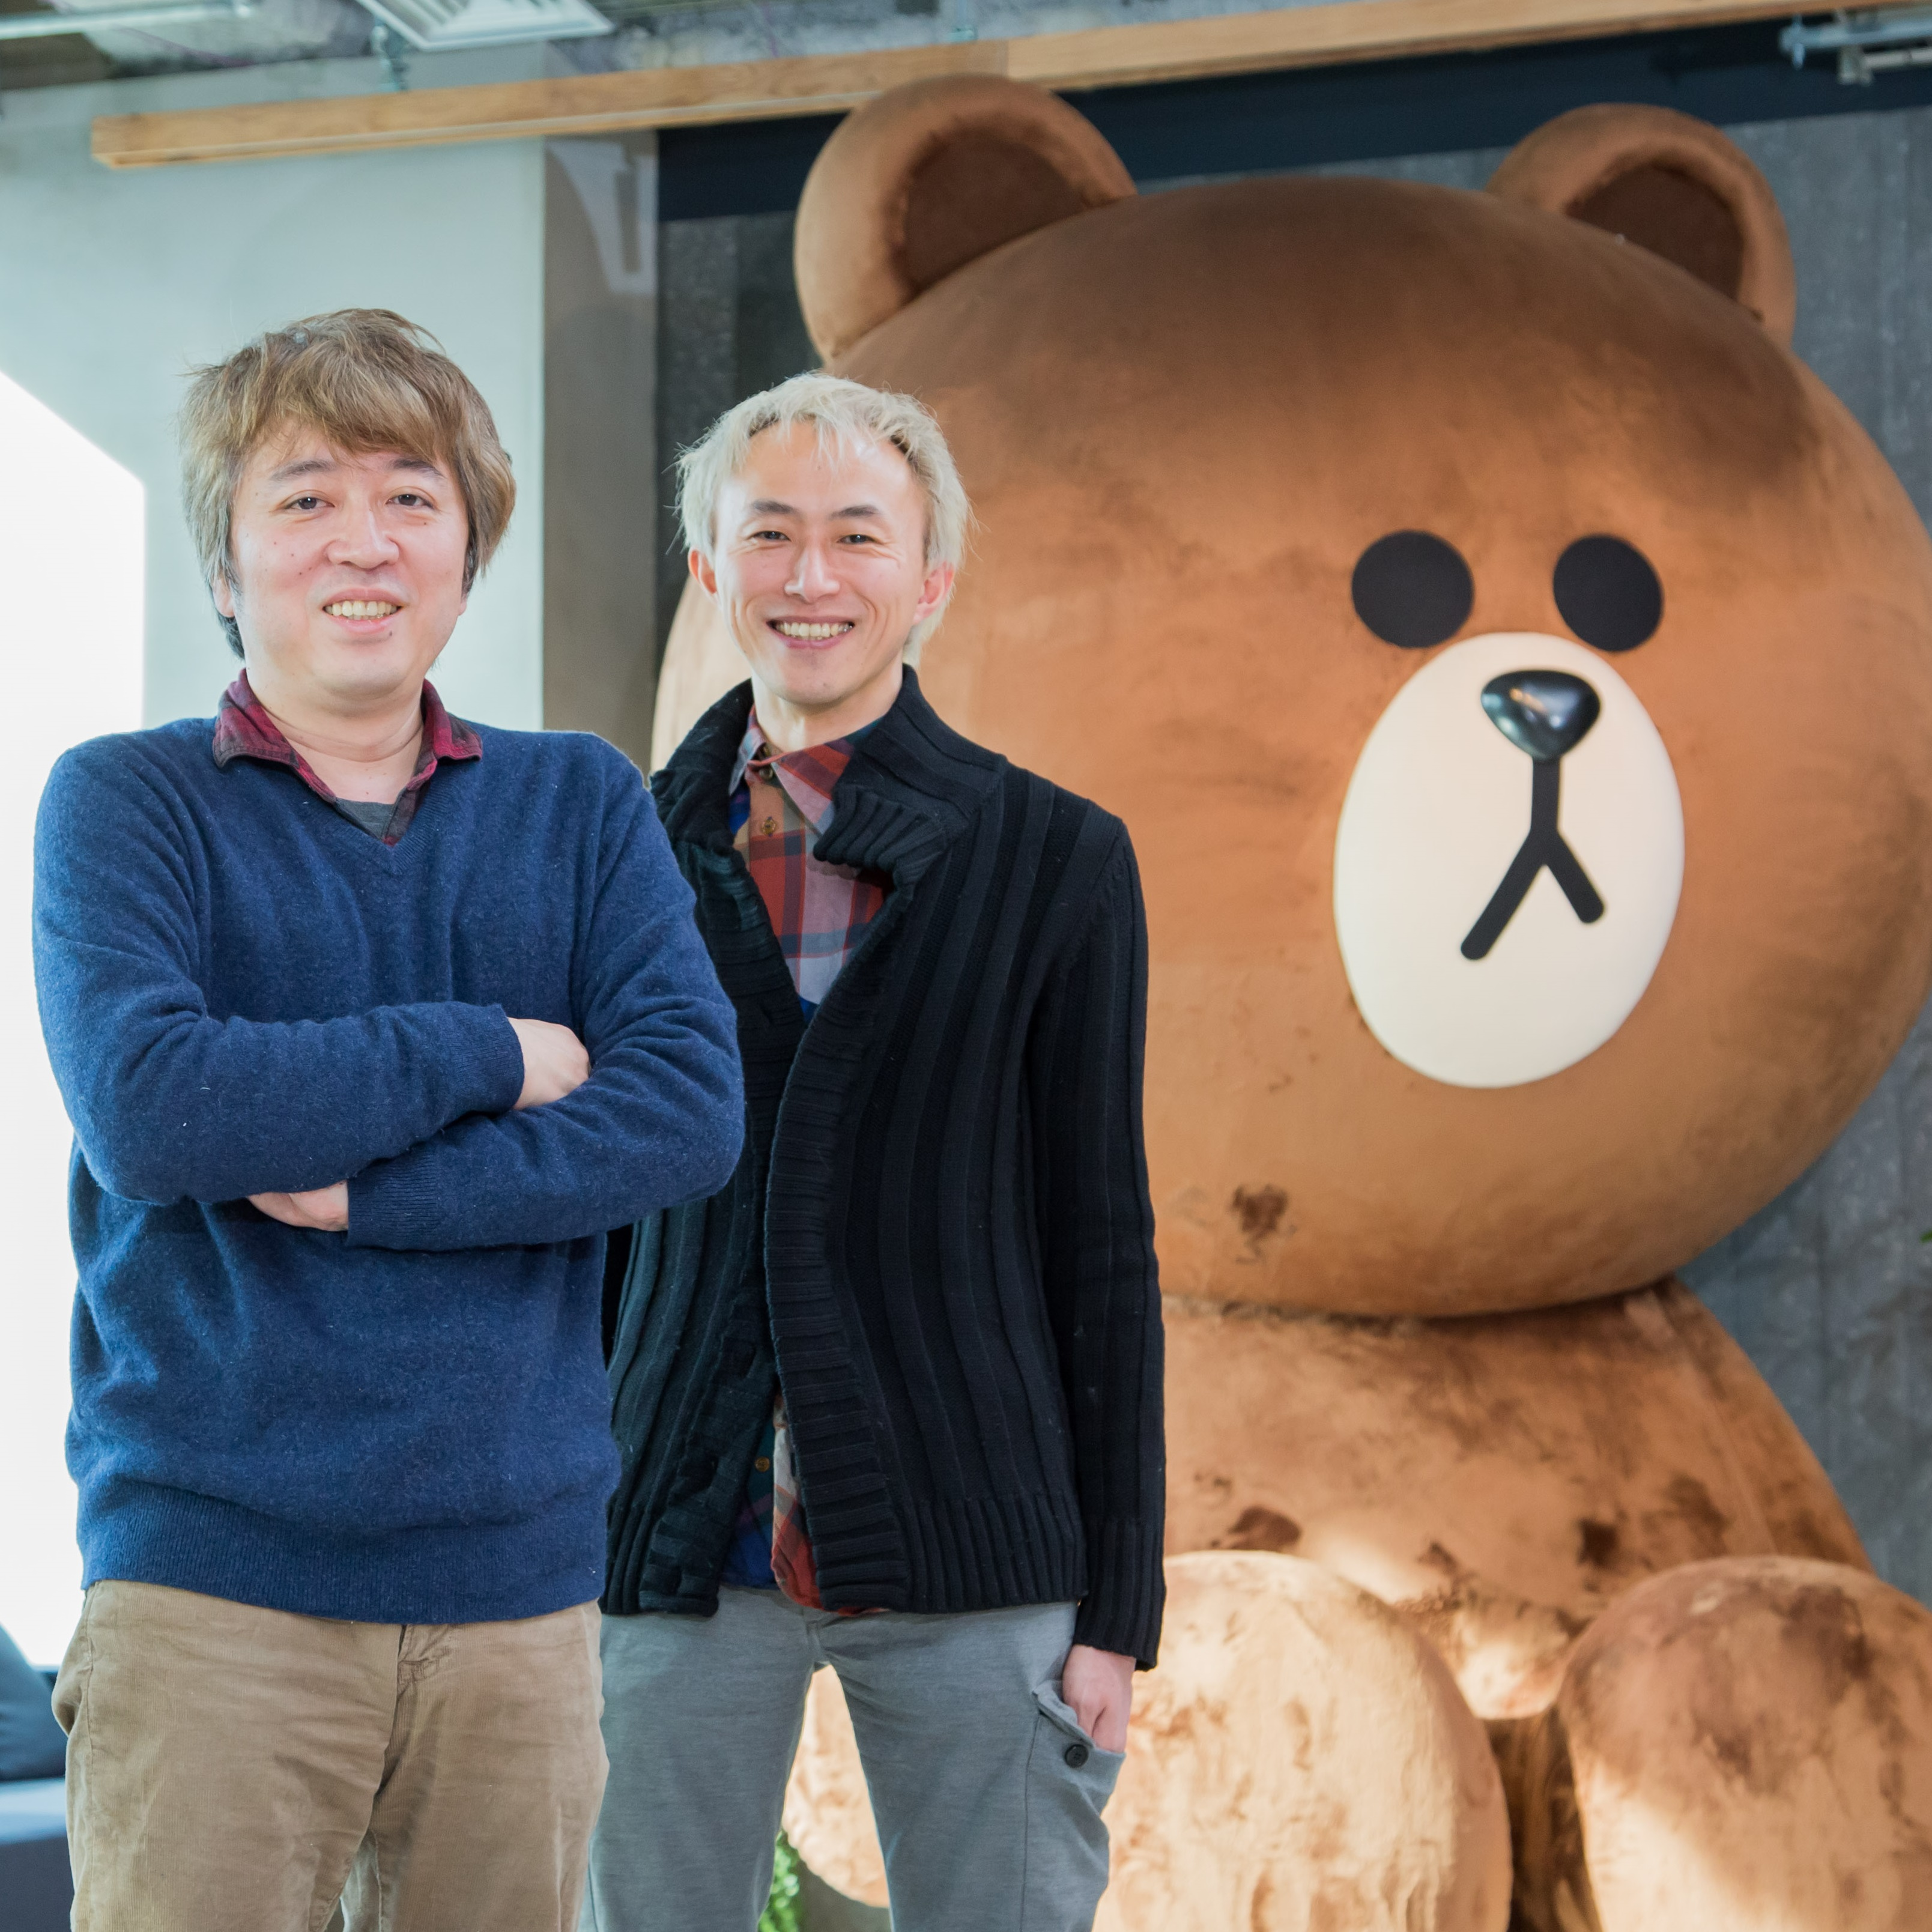 LINEが京都に新オフィスを開設! 学生へも貴重な就業体験の機会を提供予定